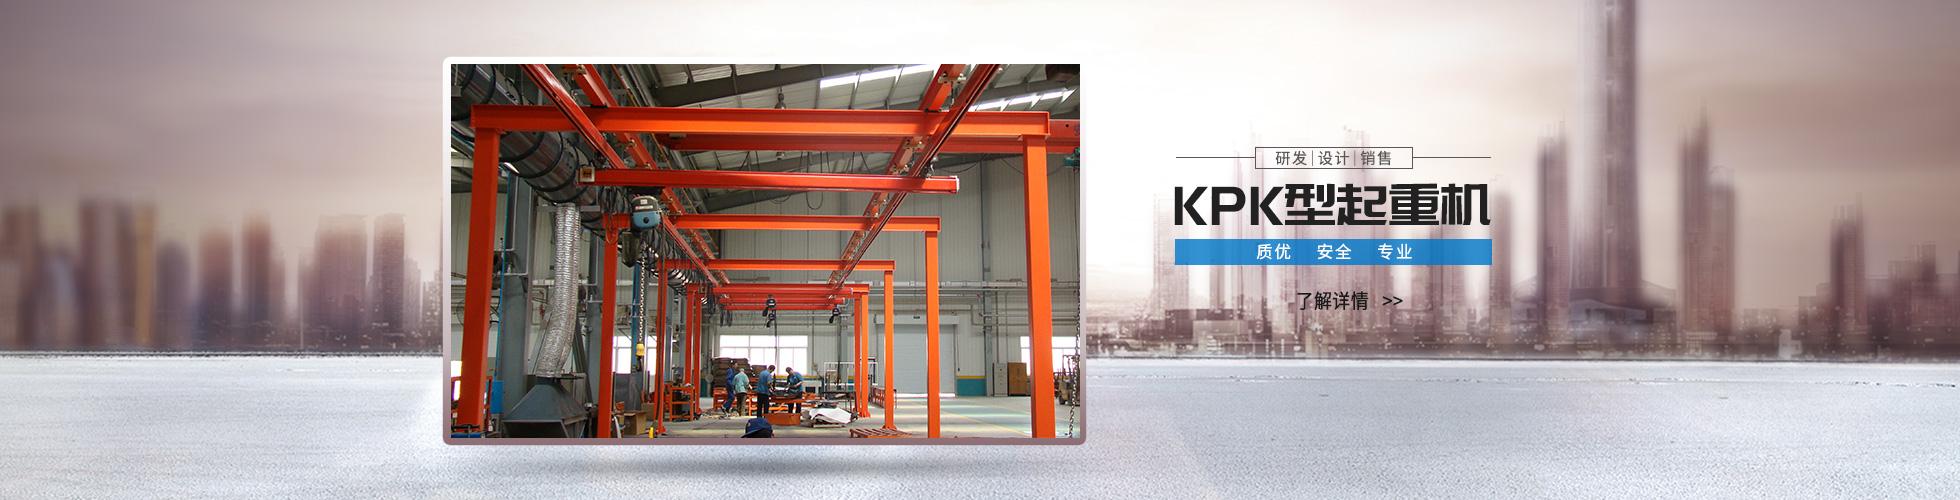 KPK型起重机